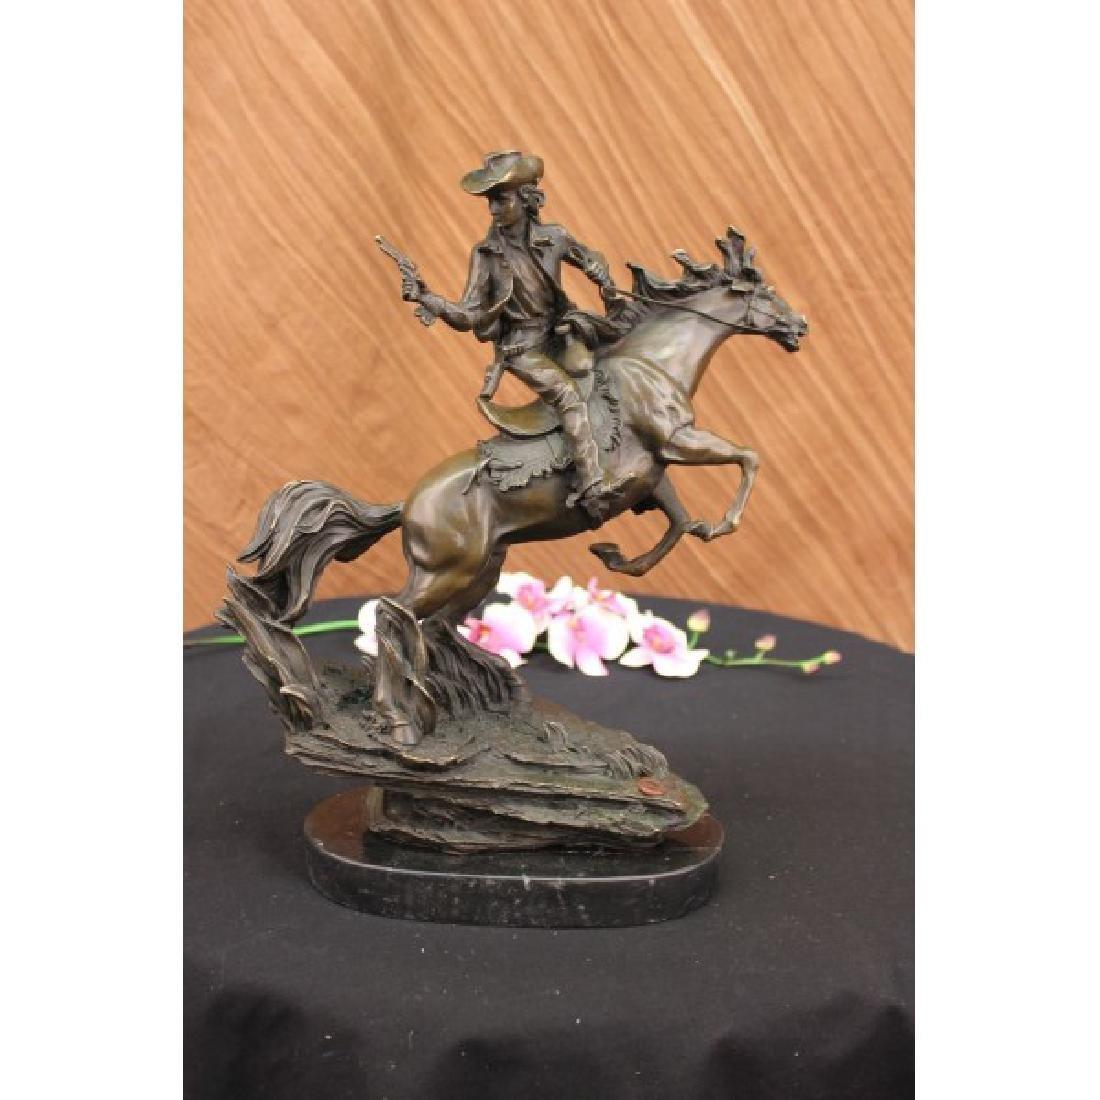 Bronze Sculpture Cowboy with Gun Riding Horse Old West